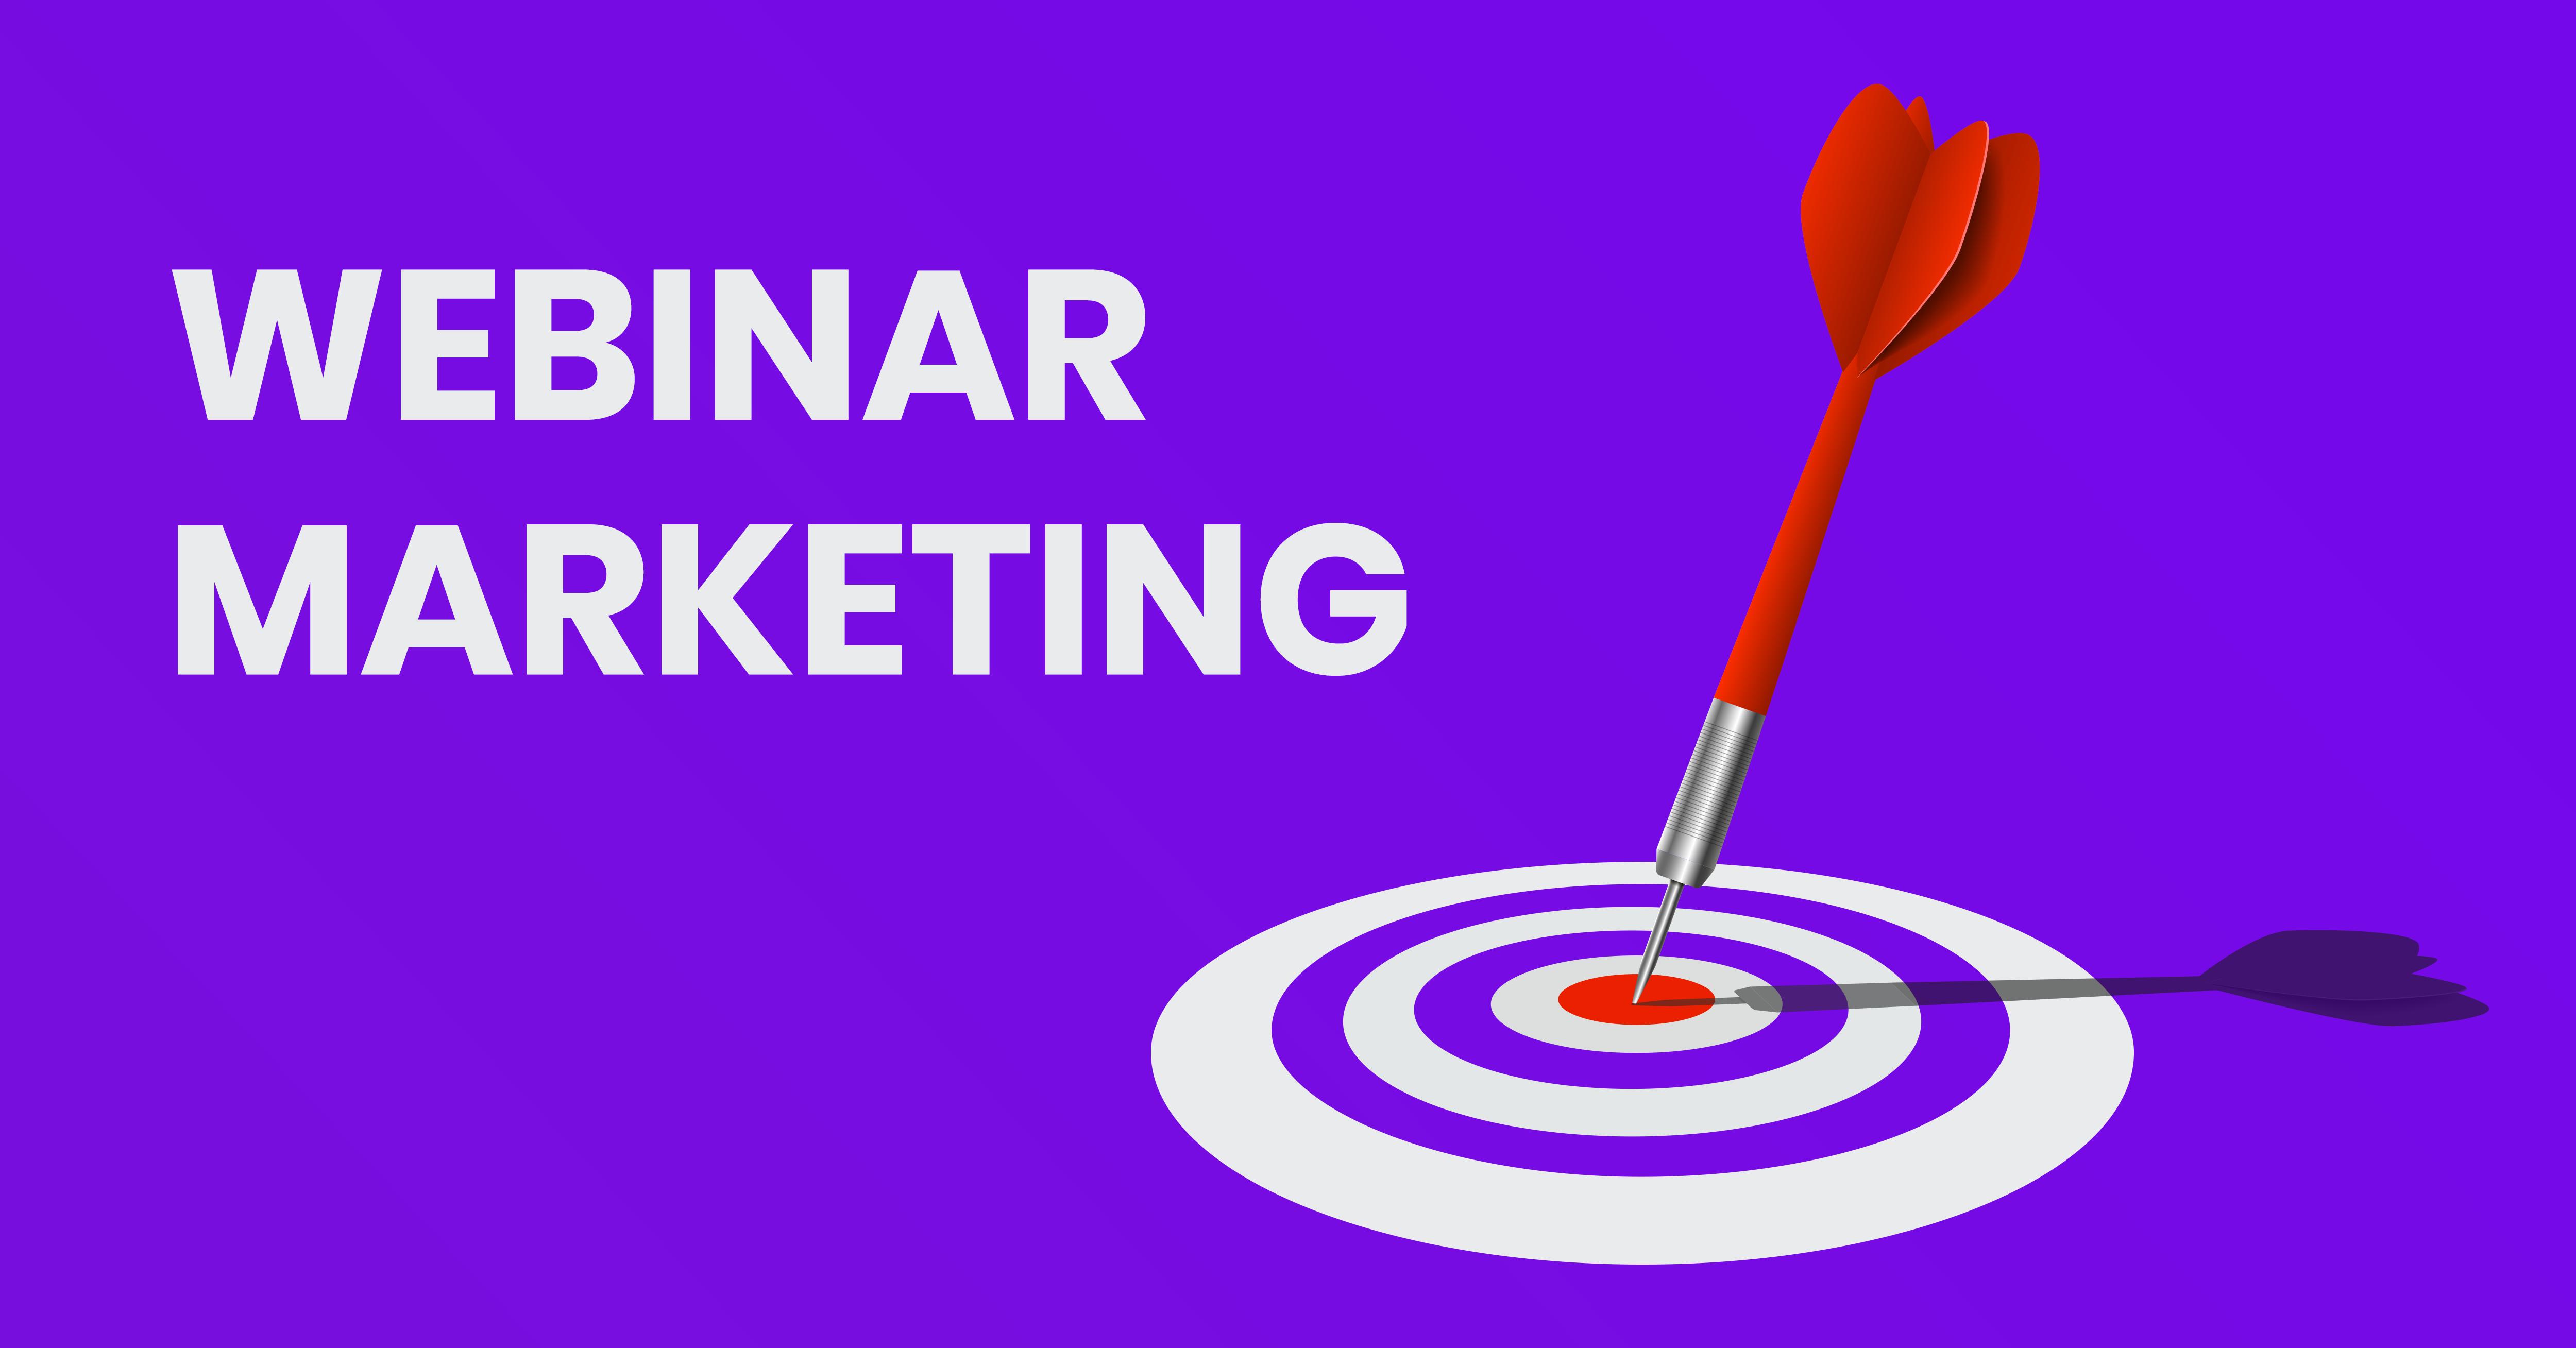 https://spotme.com/wp-content/uploads/2021/01/Herov2_How-to-Plan-and-Market-Your-Next-Webinar-Event.png